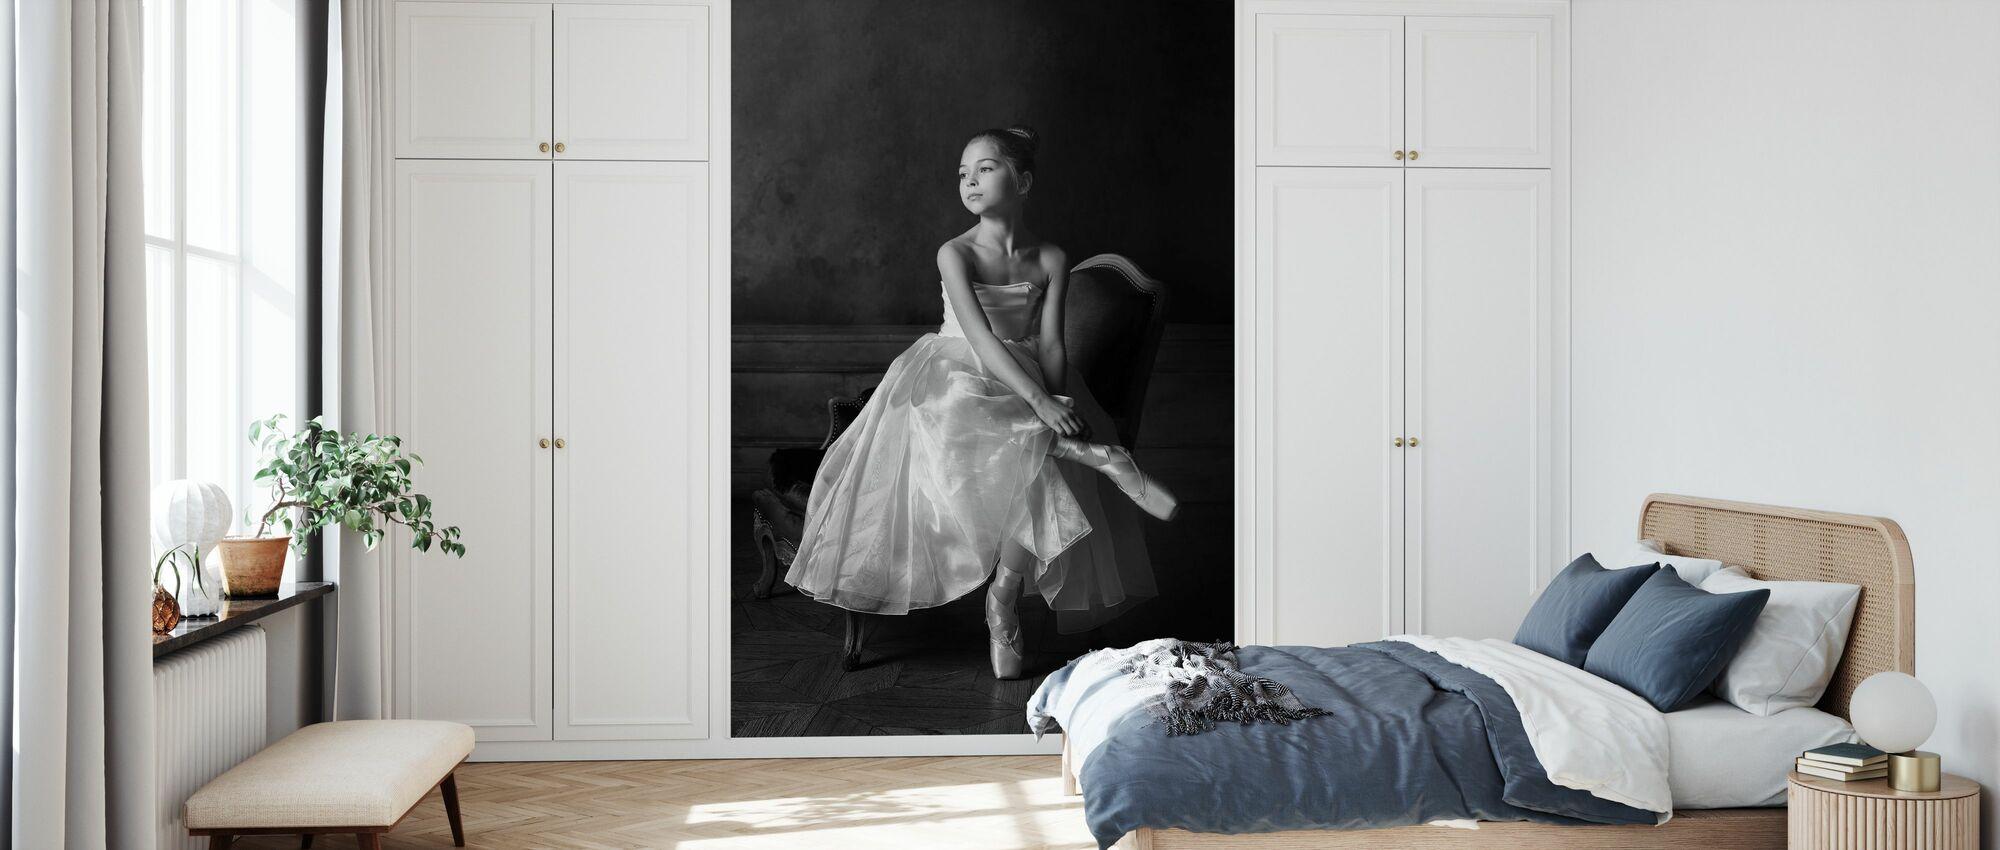 Little Ballet Star - Wallpaper - Bedroom